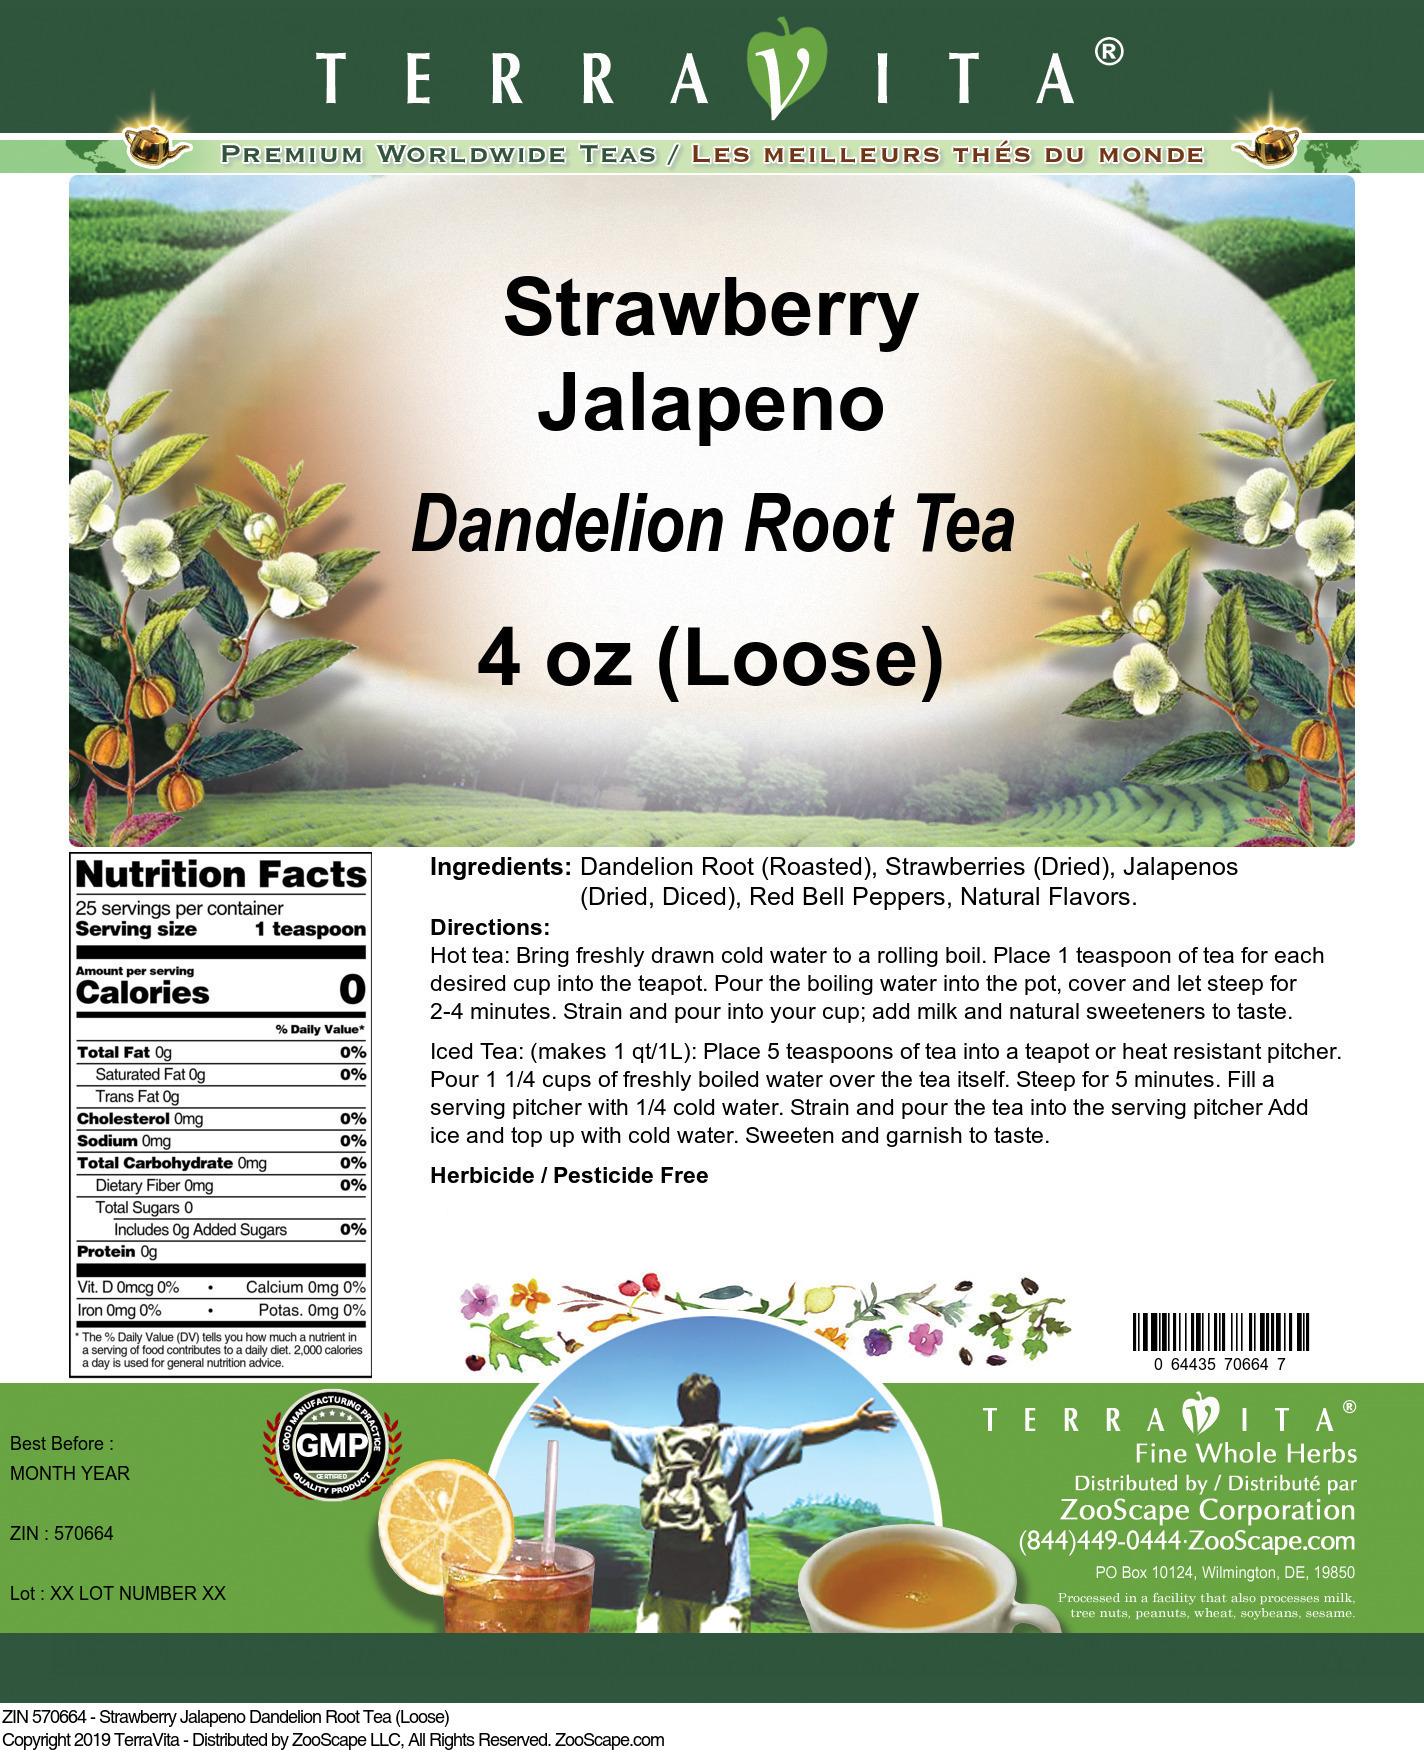 Strawberry Jalapeno Dandelion Root Tea (Loose)